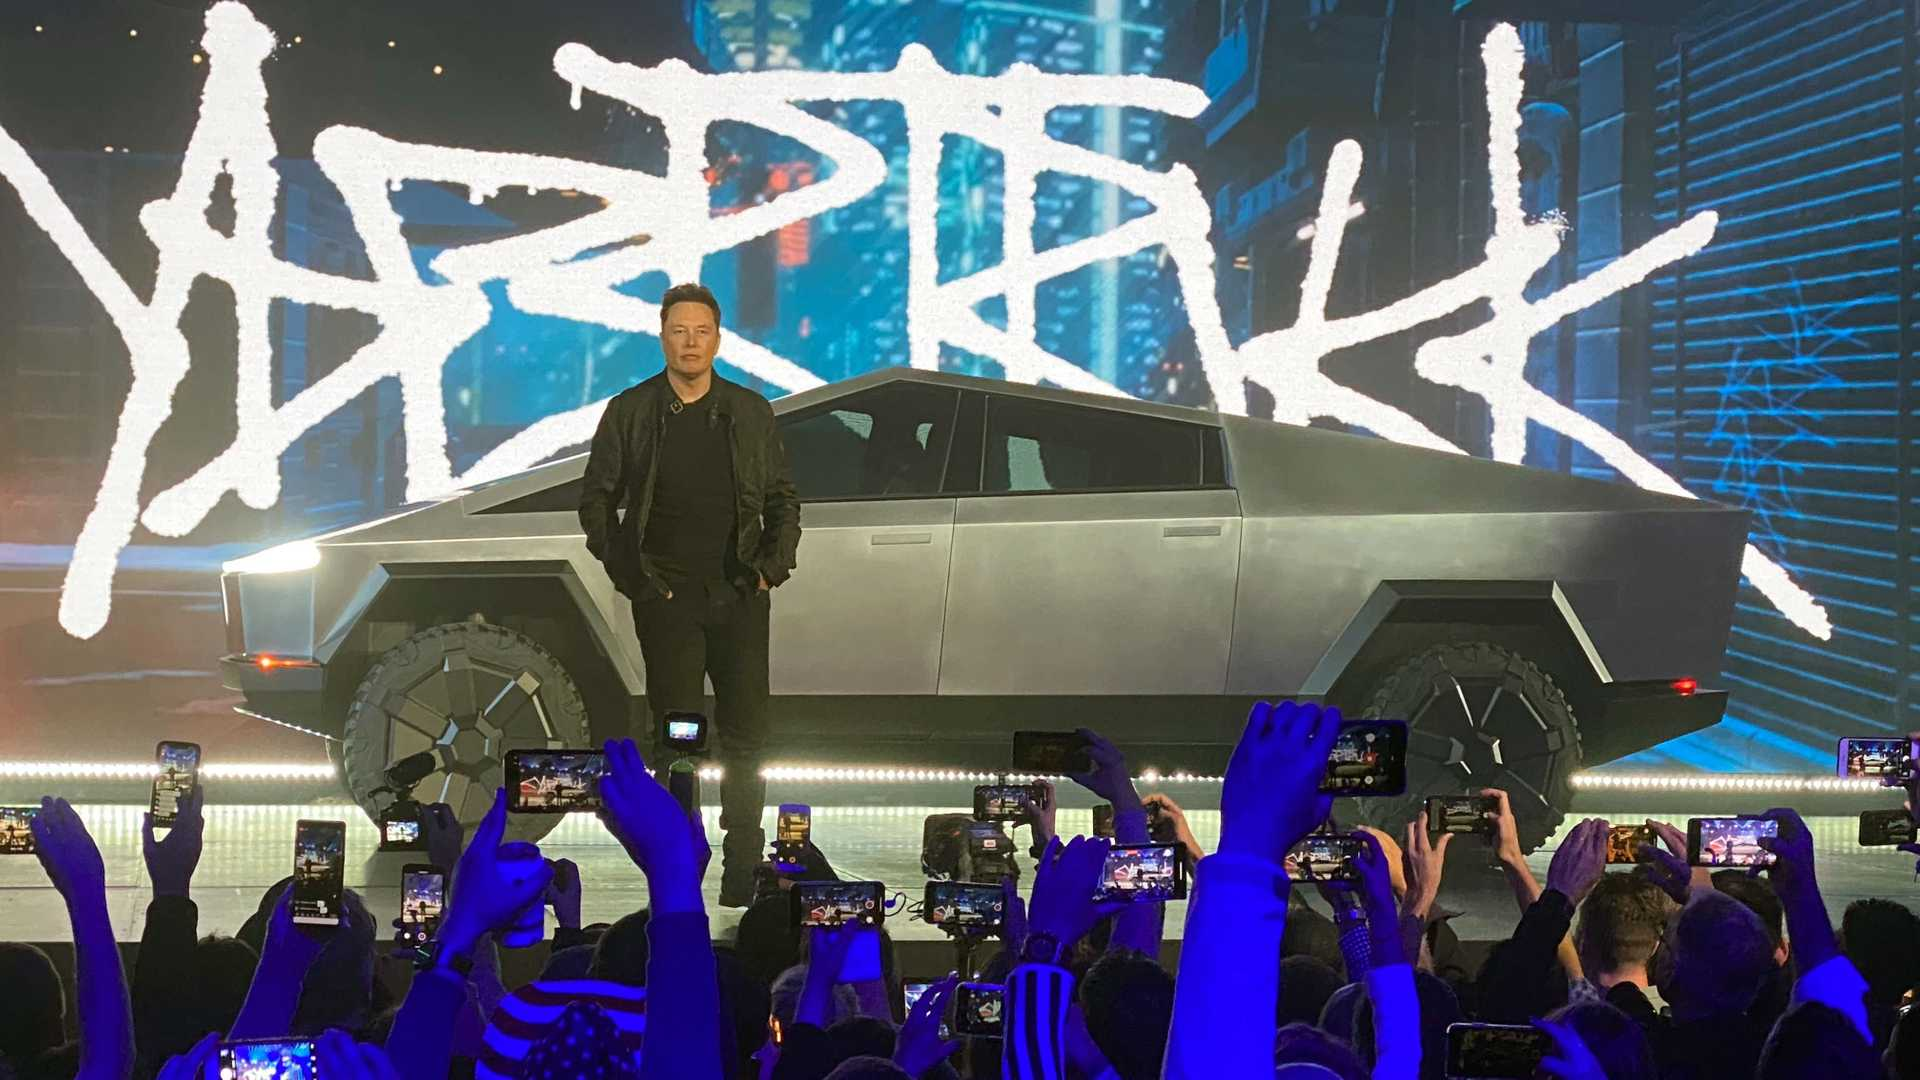 Nikola Boss Offered Elon Musk Conventional Truck Design For Free